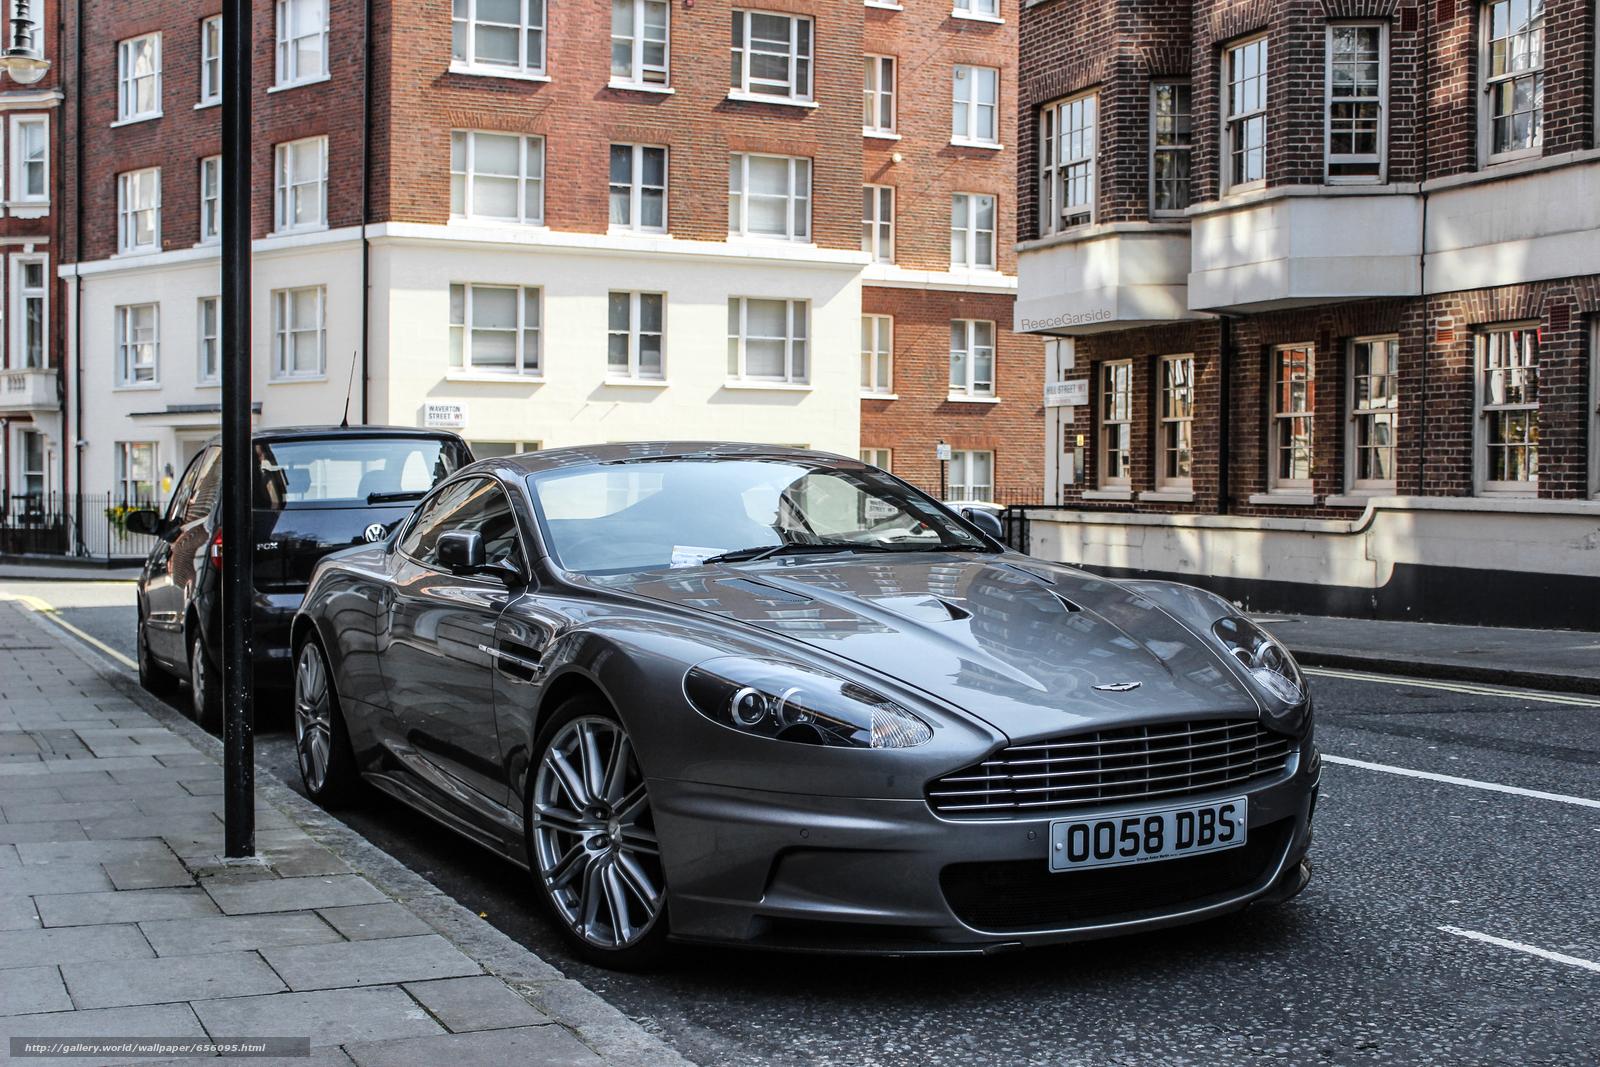 Descargar gratis Aston Martin,  máquina,  coche Fondos de escritorio en la resolucin 5184x3456 — imagen №656095